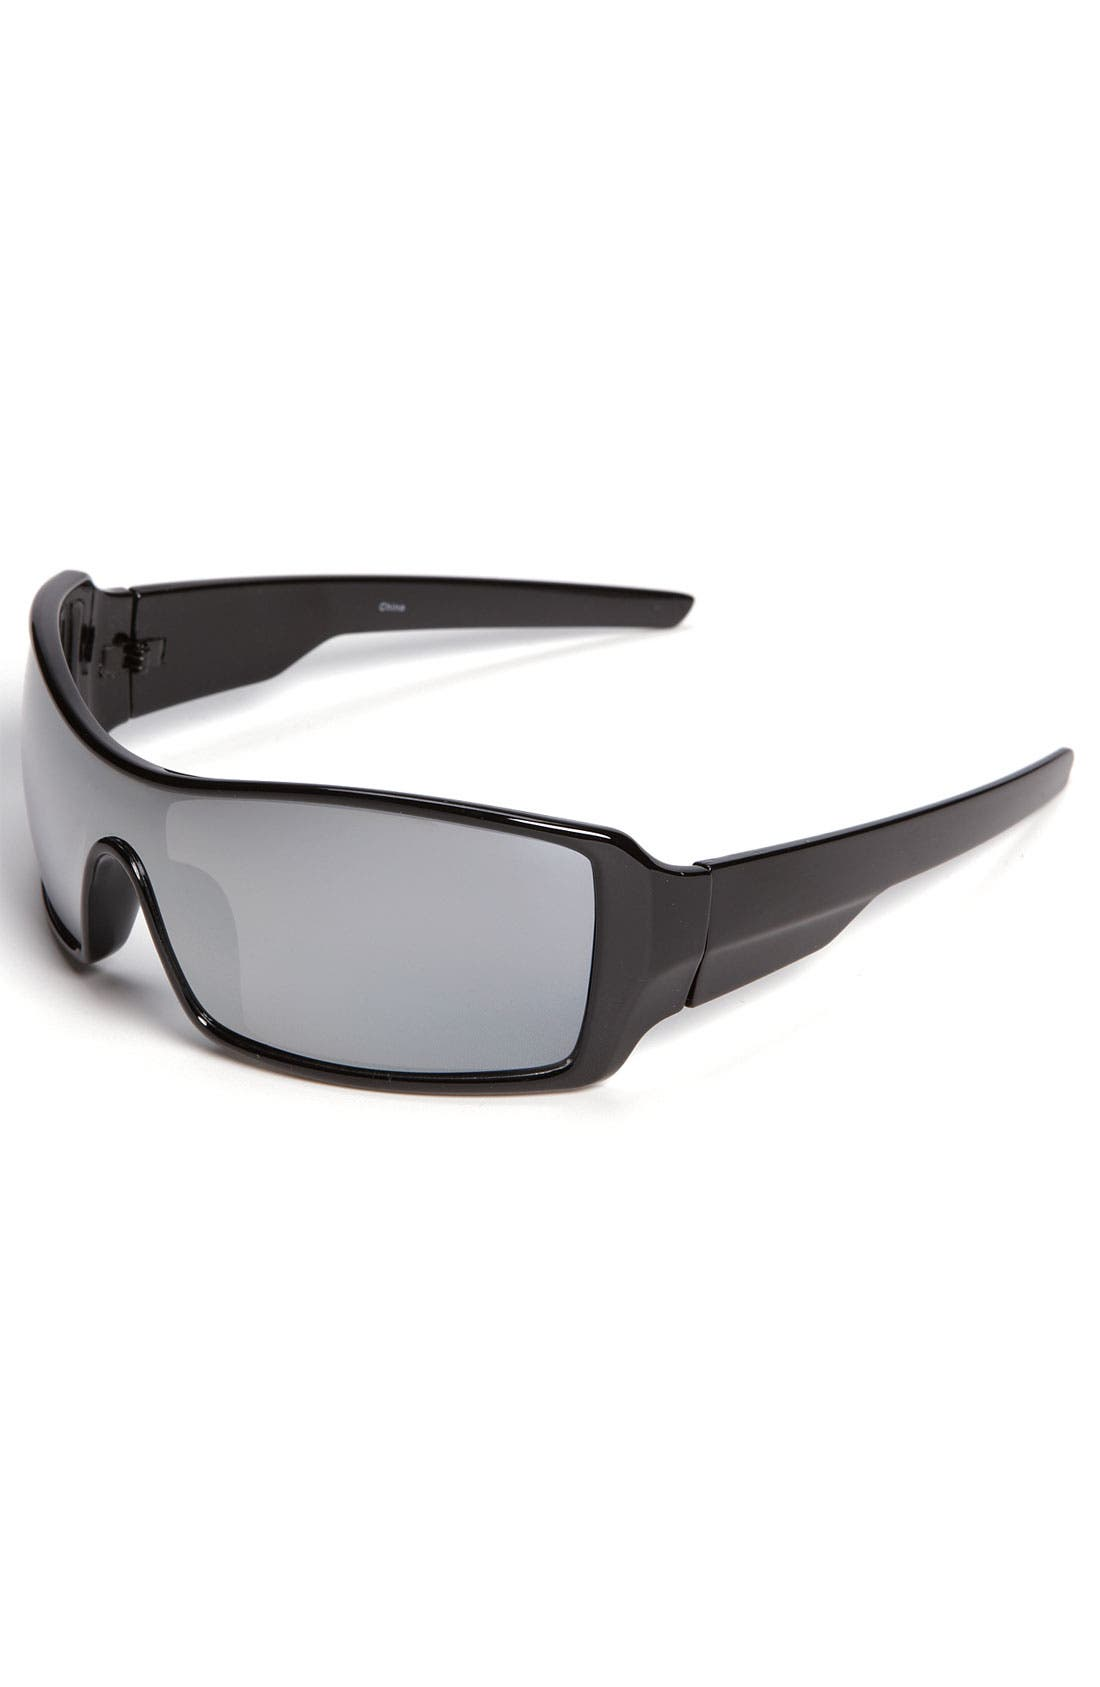 Alternate Image 1 Selected - Icon Eyewear 'Max' Shield Sunglasses (Big Boys)